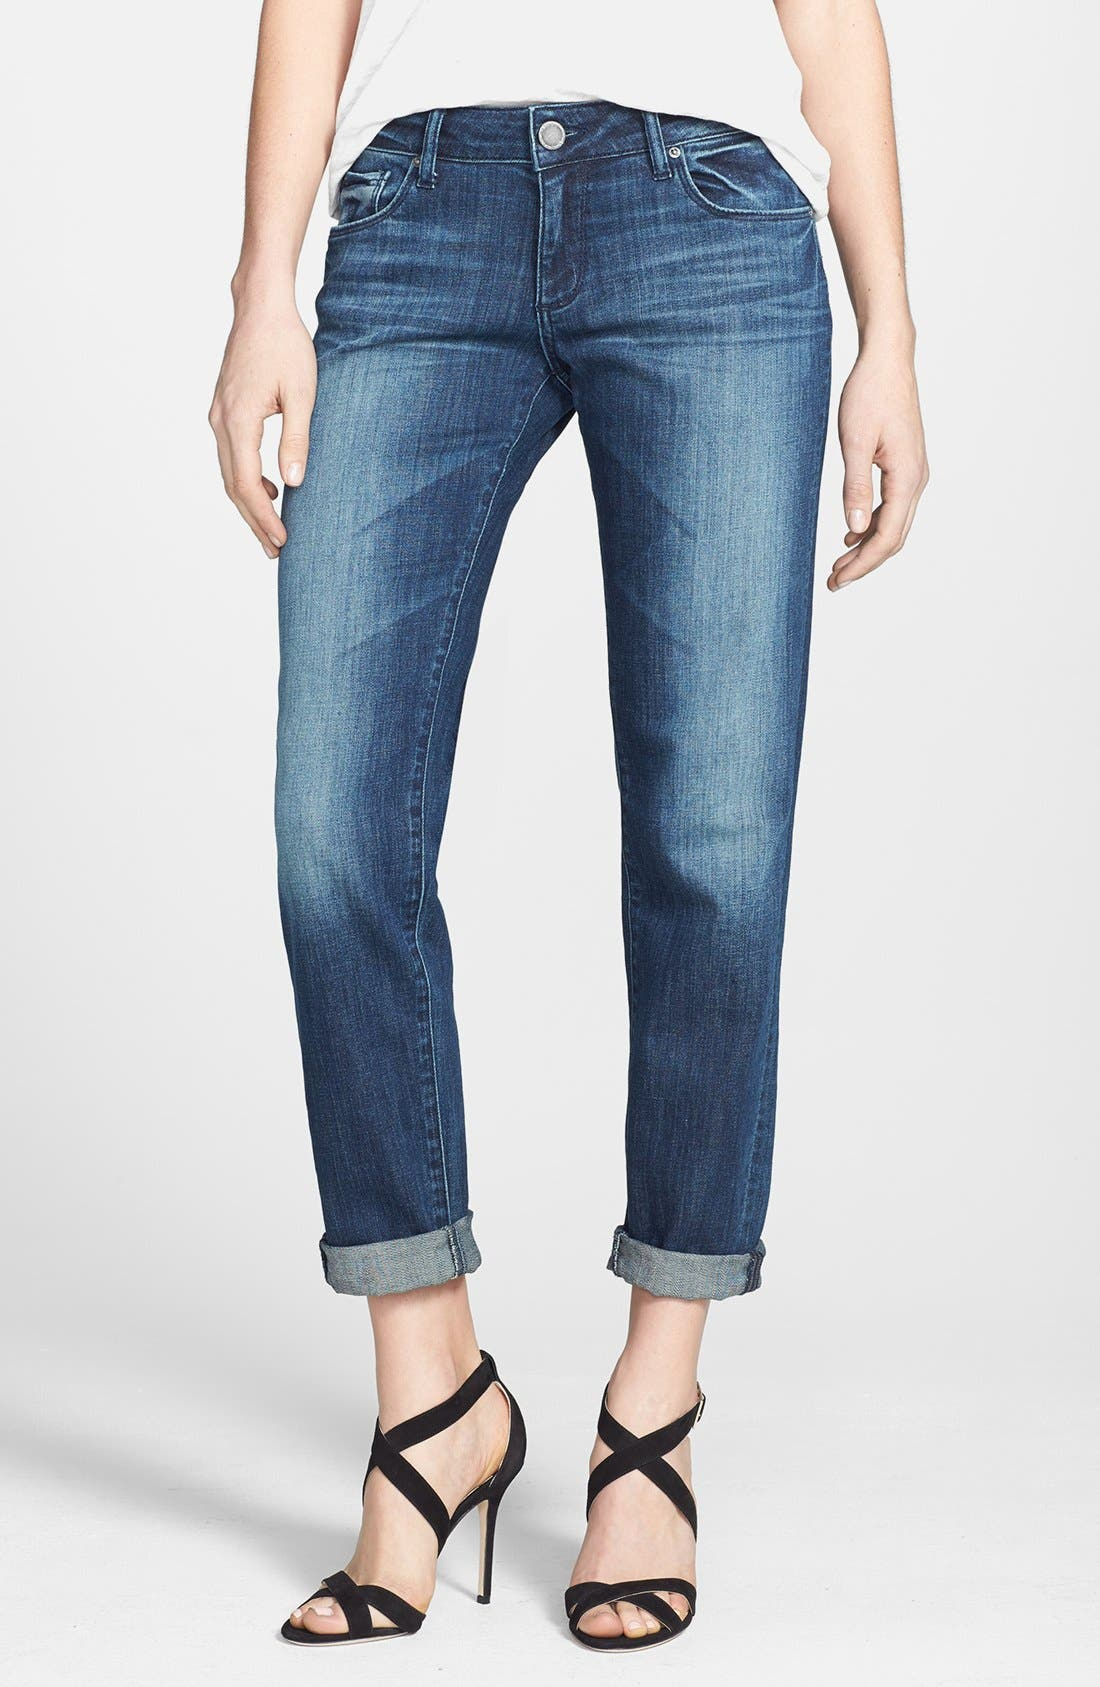 Alternate Image 1 Selected - DL1961 'Riley' Boyfriend Jeans (Nassau)